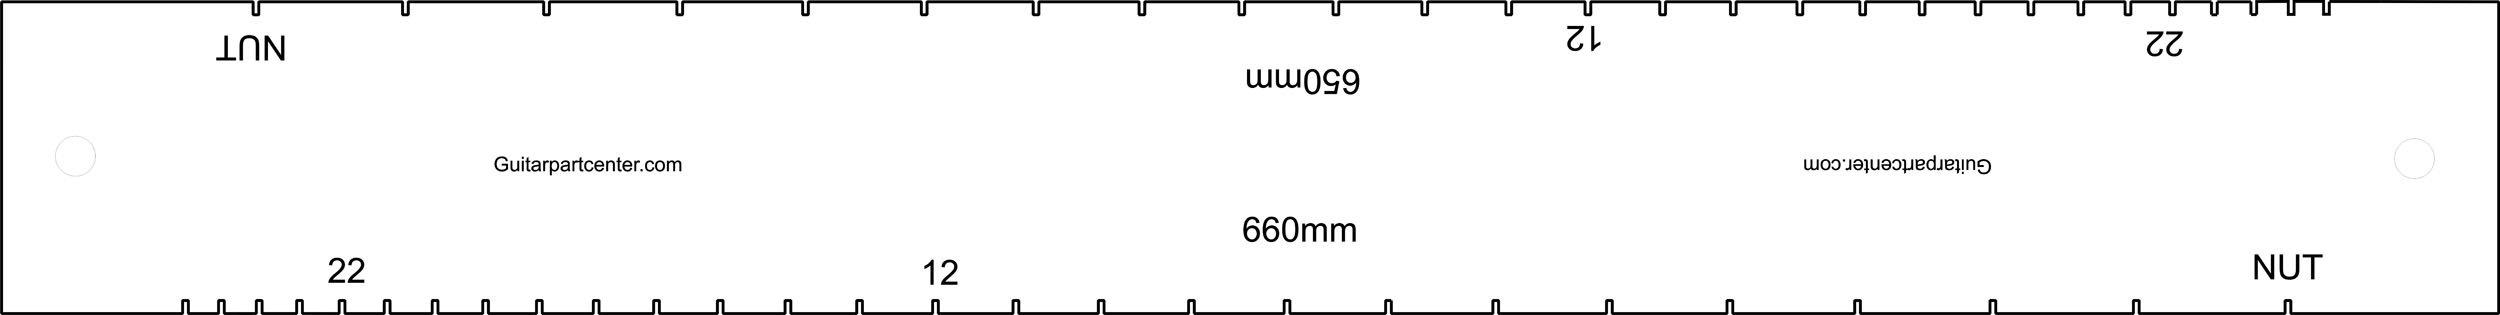 Dual Scal Fingerboard Slotting Template - 650mm & 660mm